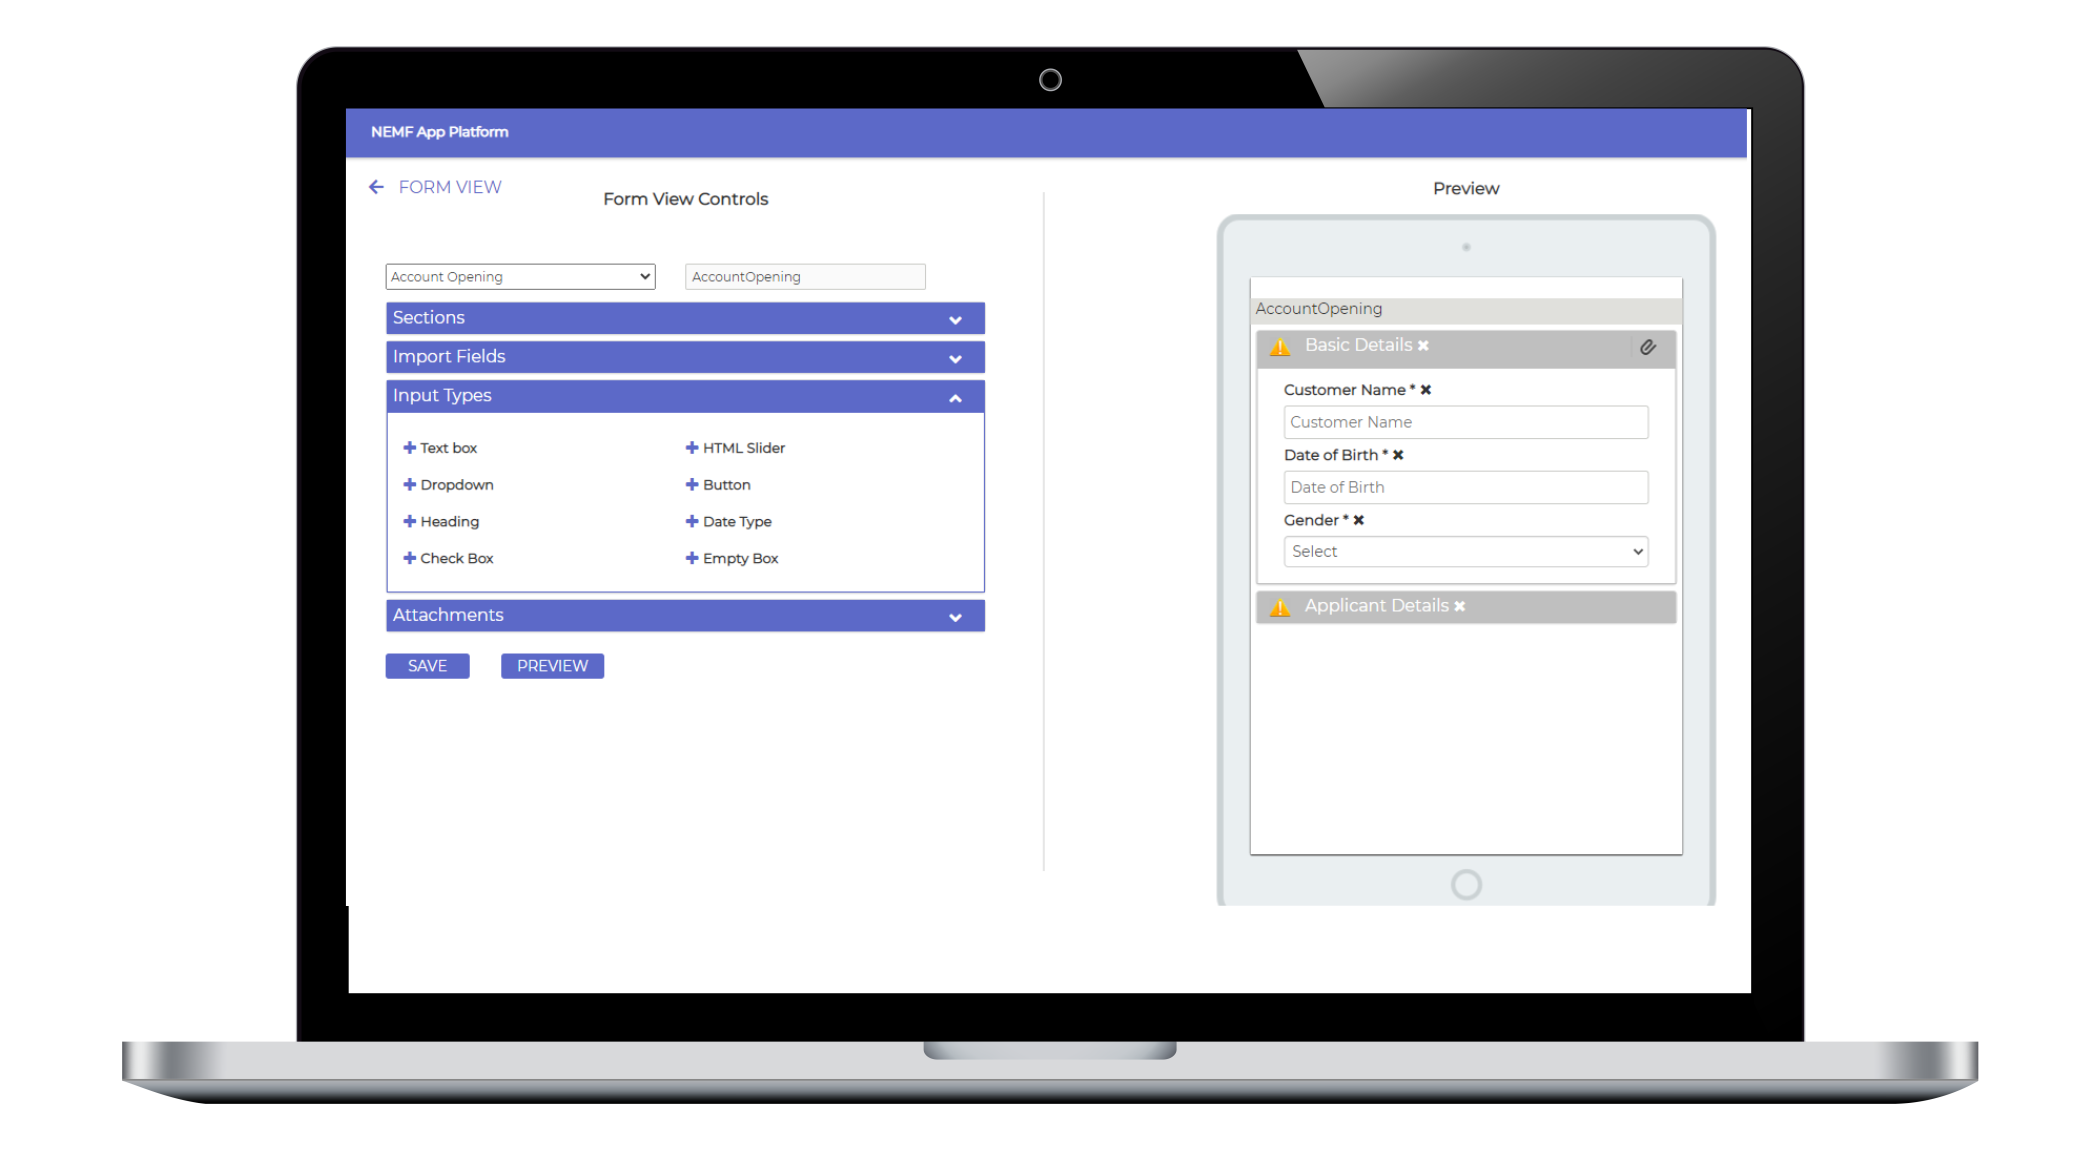 Enterprise Mobility - Platform